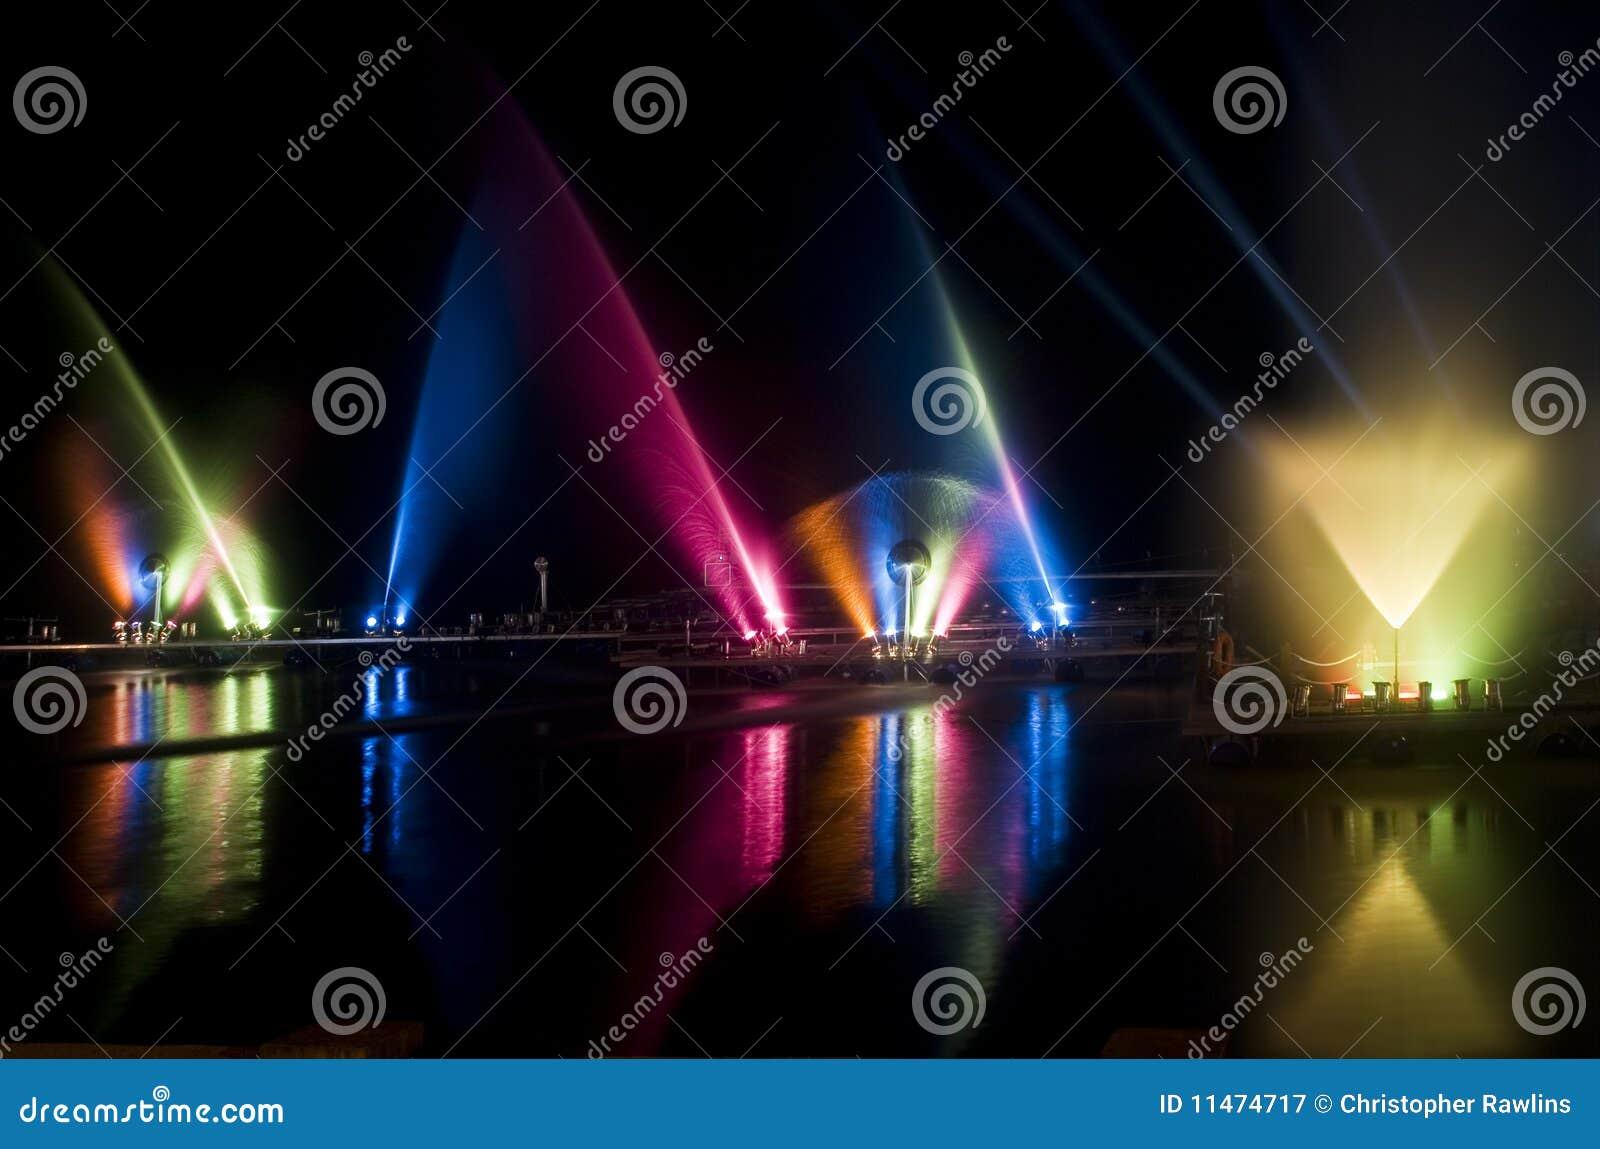 Light Show on a lake